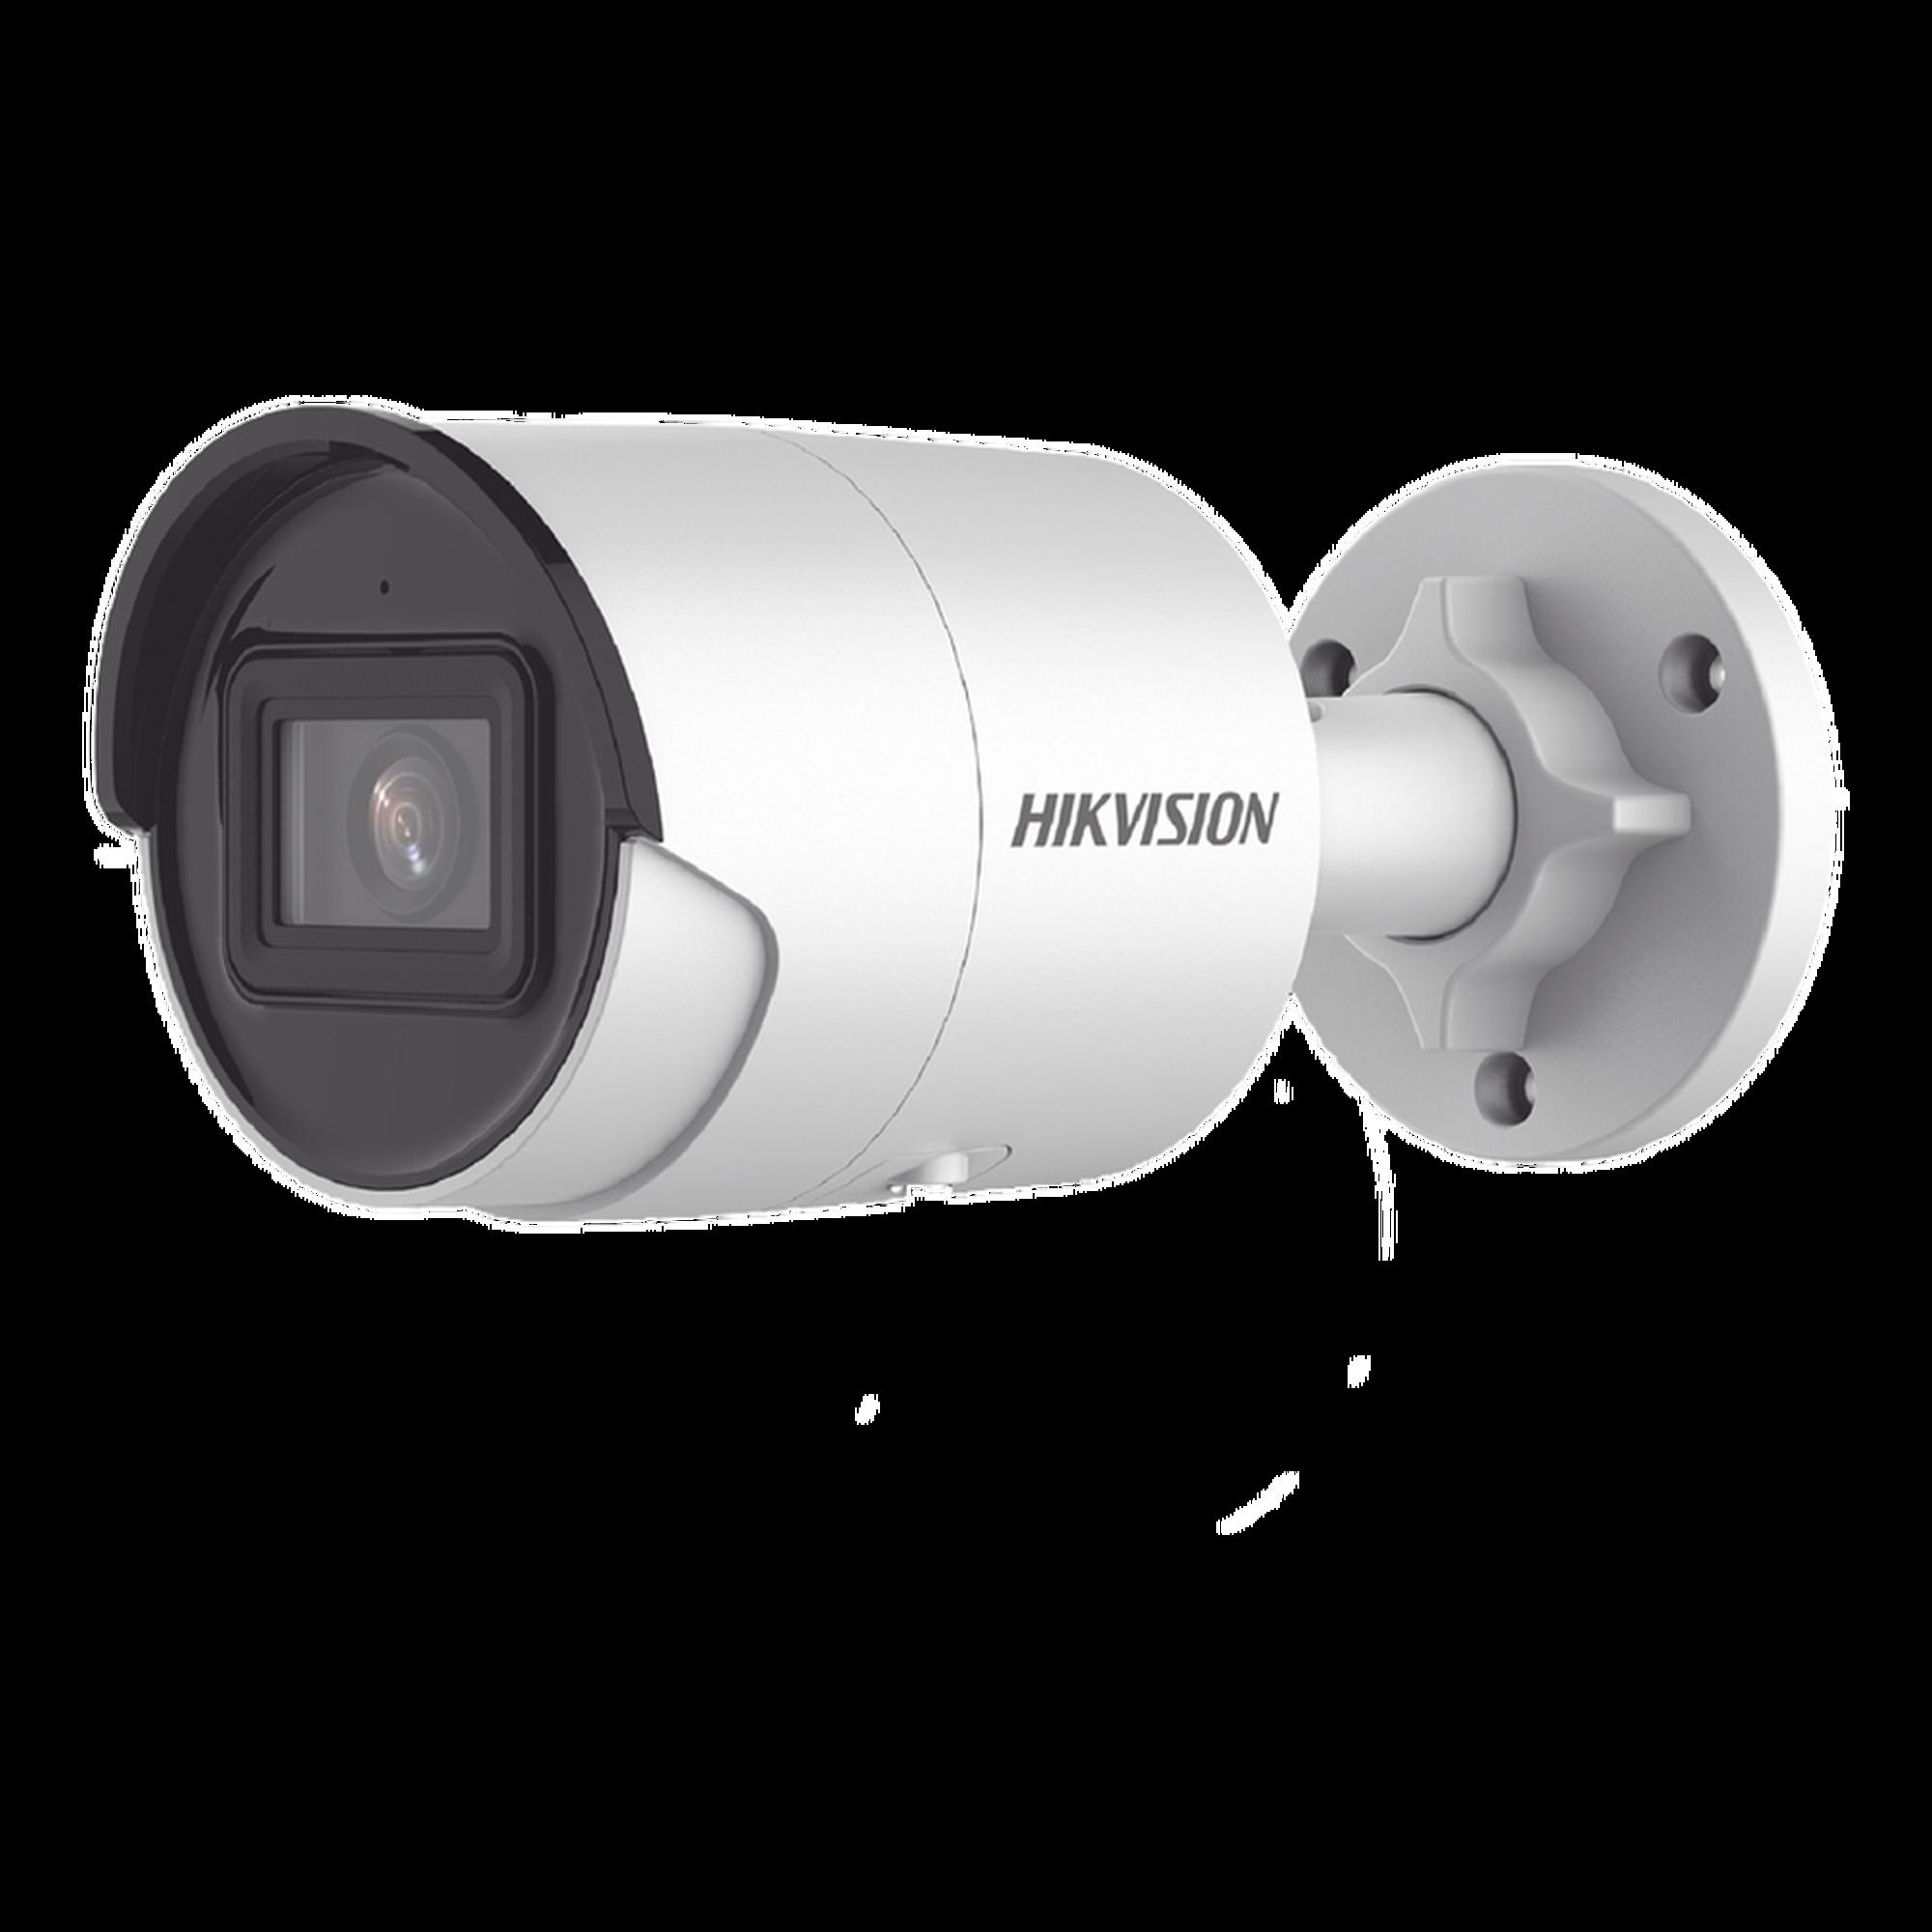 Bala IP 4 Megapixel / Lente 2.8 mm / 40 mts IR EXIR / IP67 / WDR 120 dB / PoE / Micrófono Integrado / Videoanaliticos (Filtro de Falsas Alarmas) / Ultra Baja Iluminación